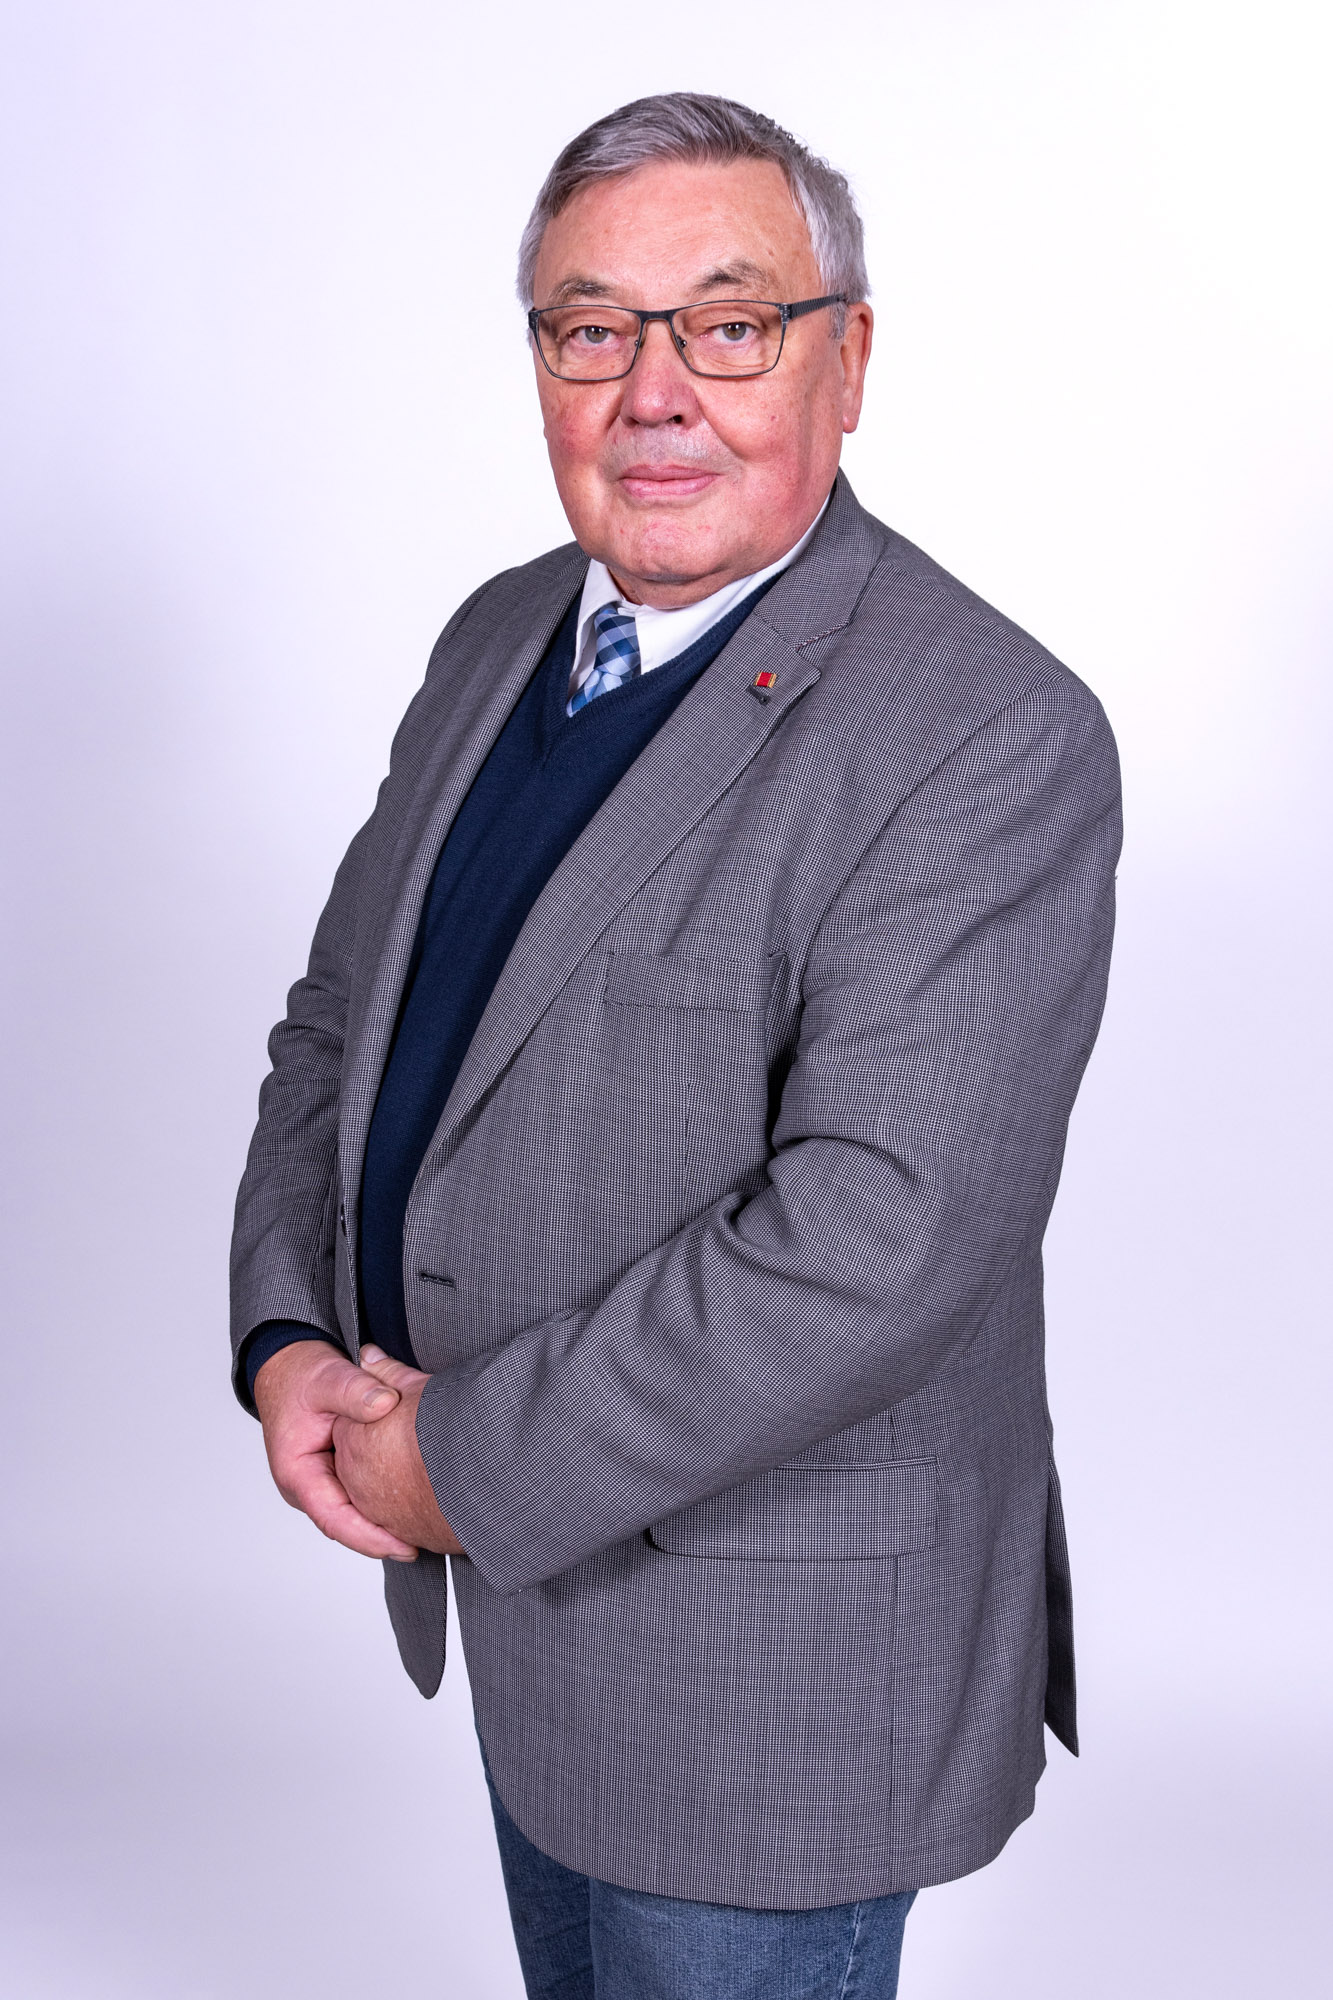 Wilhelm Ahlert